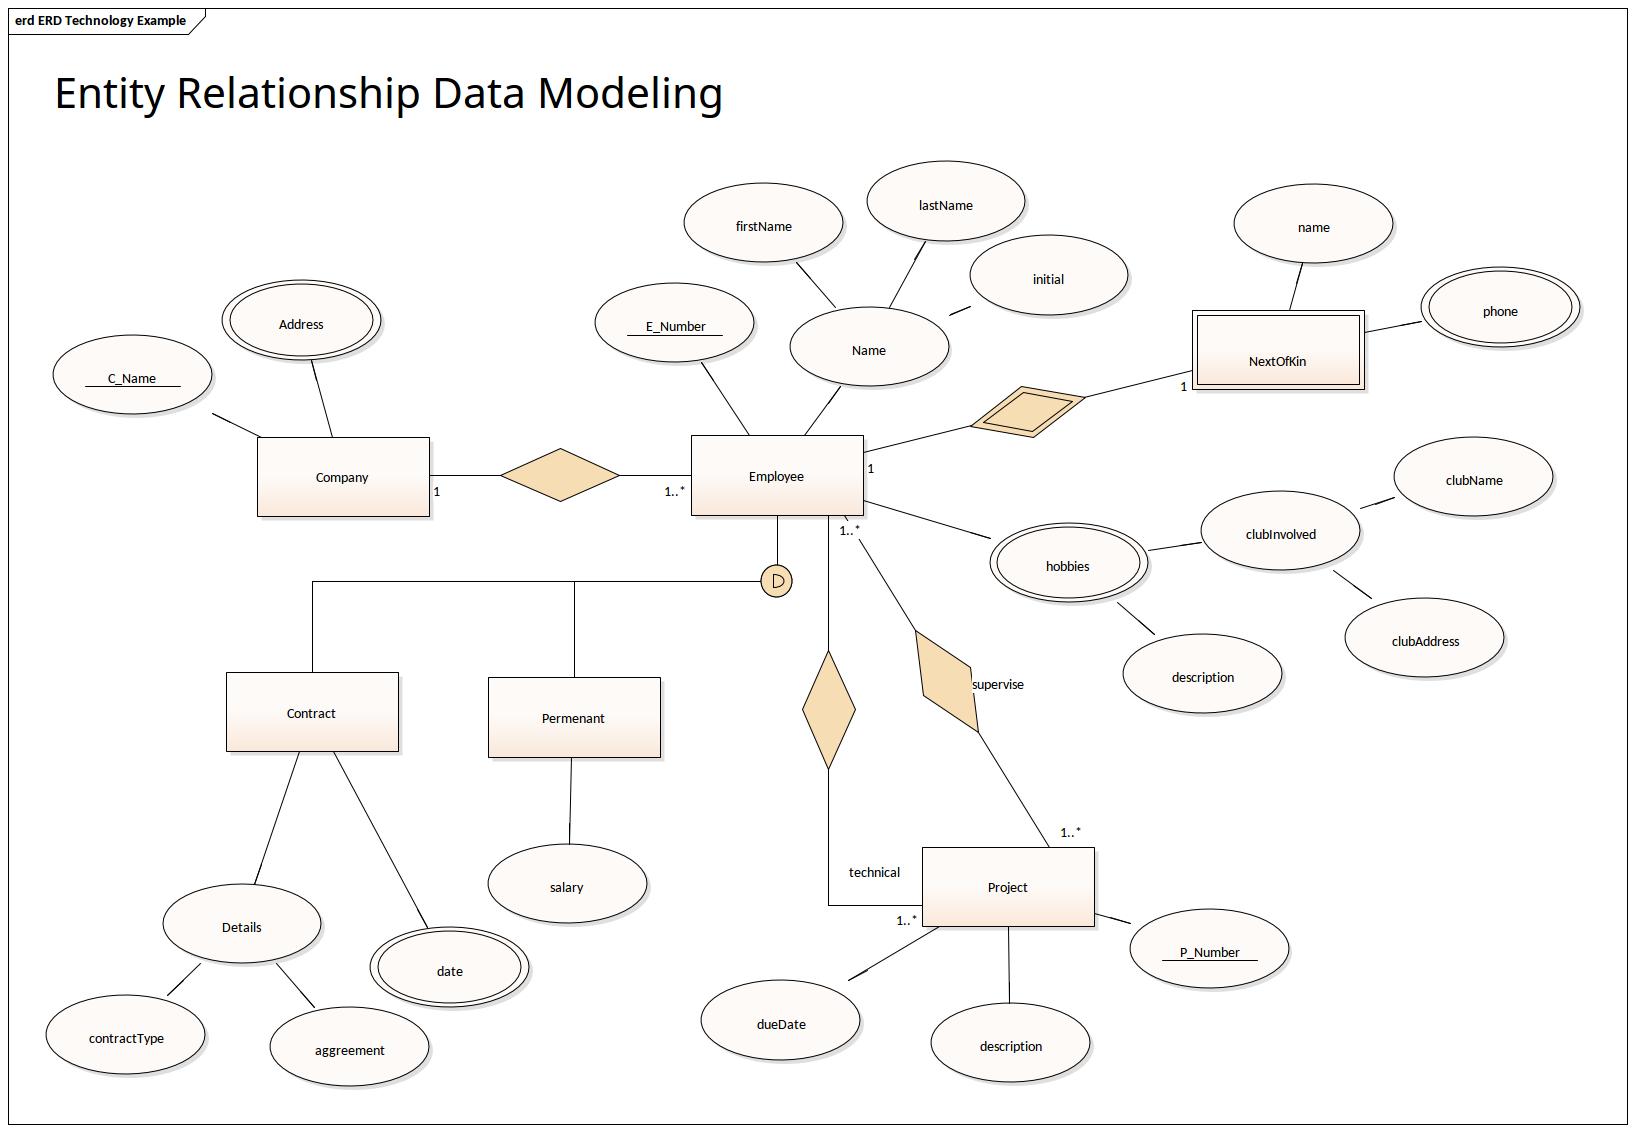 Entity Relationship Data Modeling | Enterprise Architect regarding Data Entity Diagram